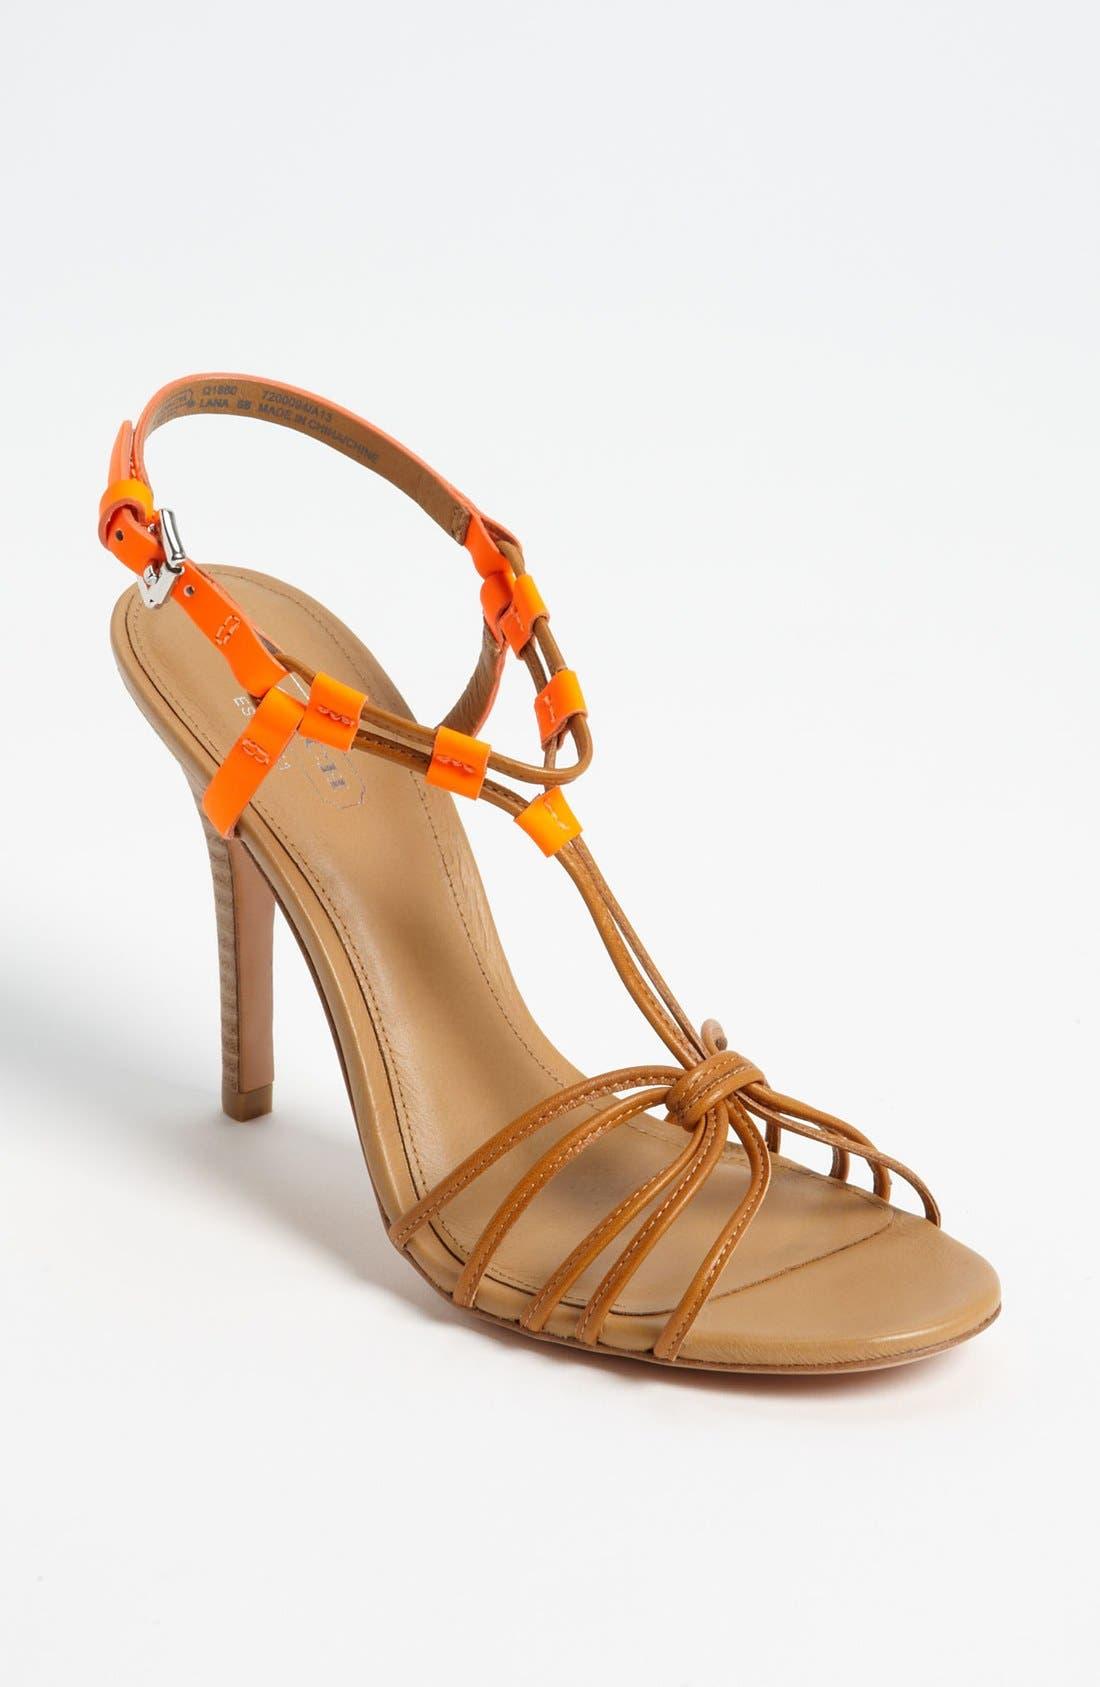 Alternate Image 1 Selected - COACH 'Lana' Sandal